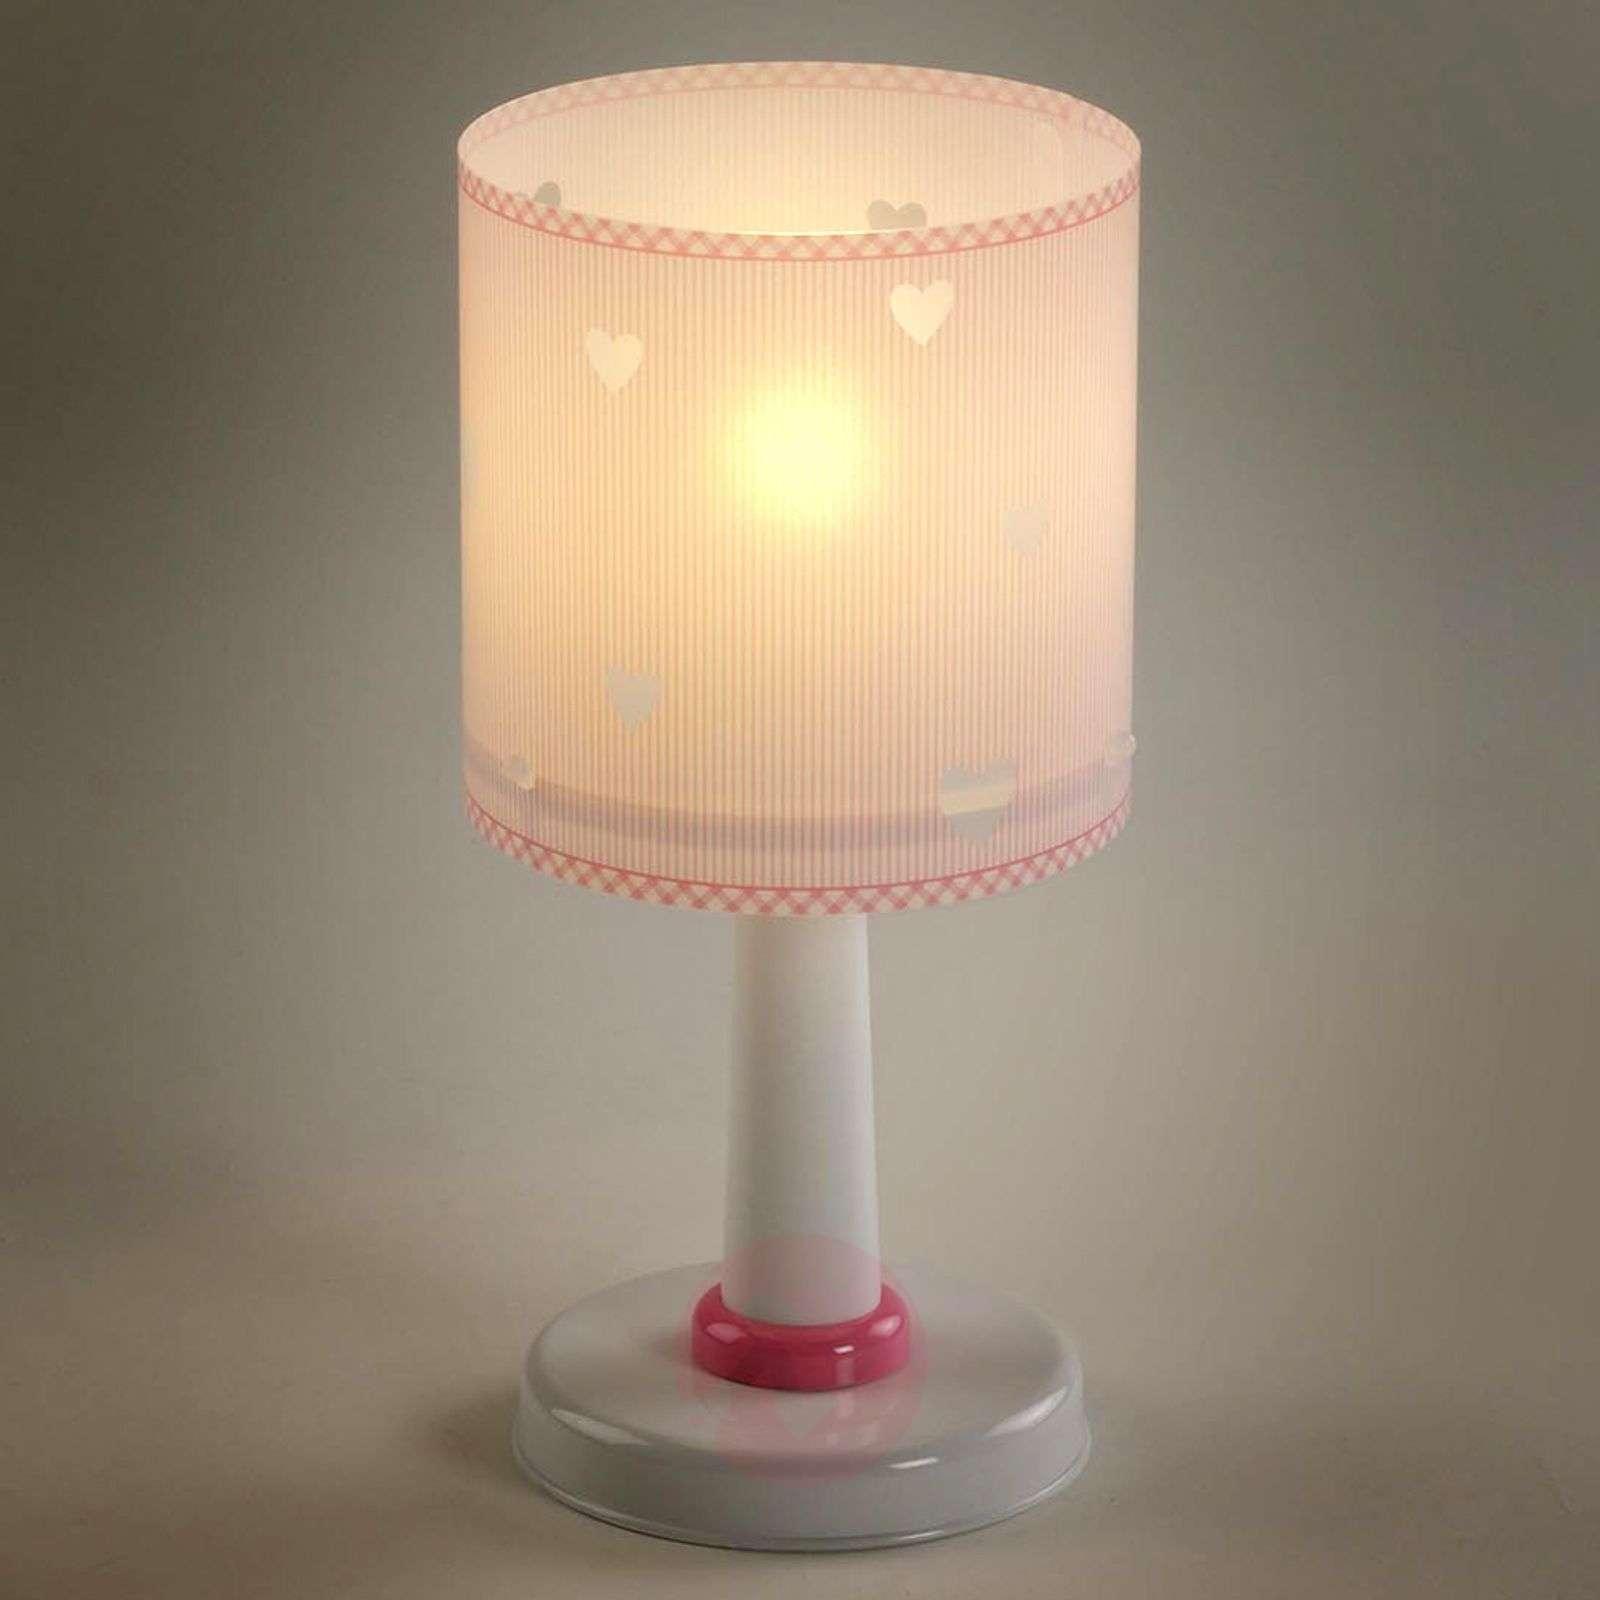 Pink table lamp Sweet Dreams-2507379-01